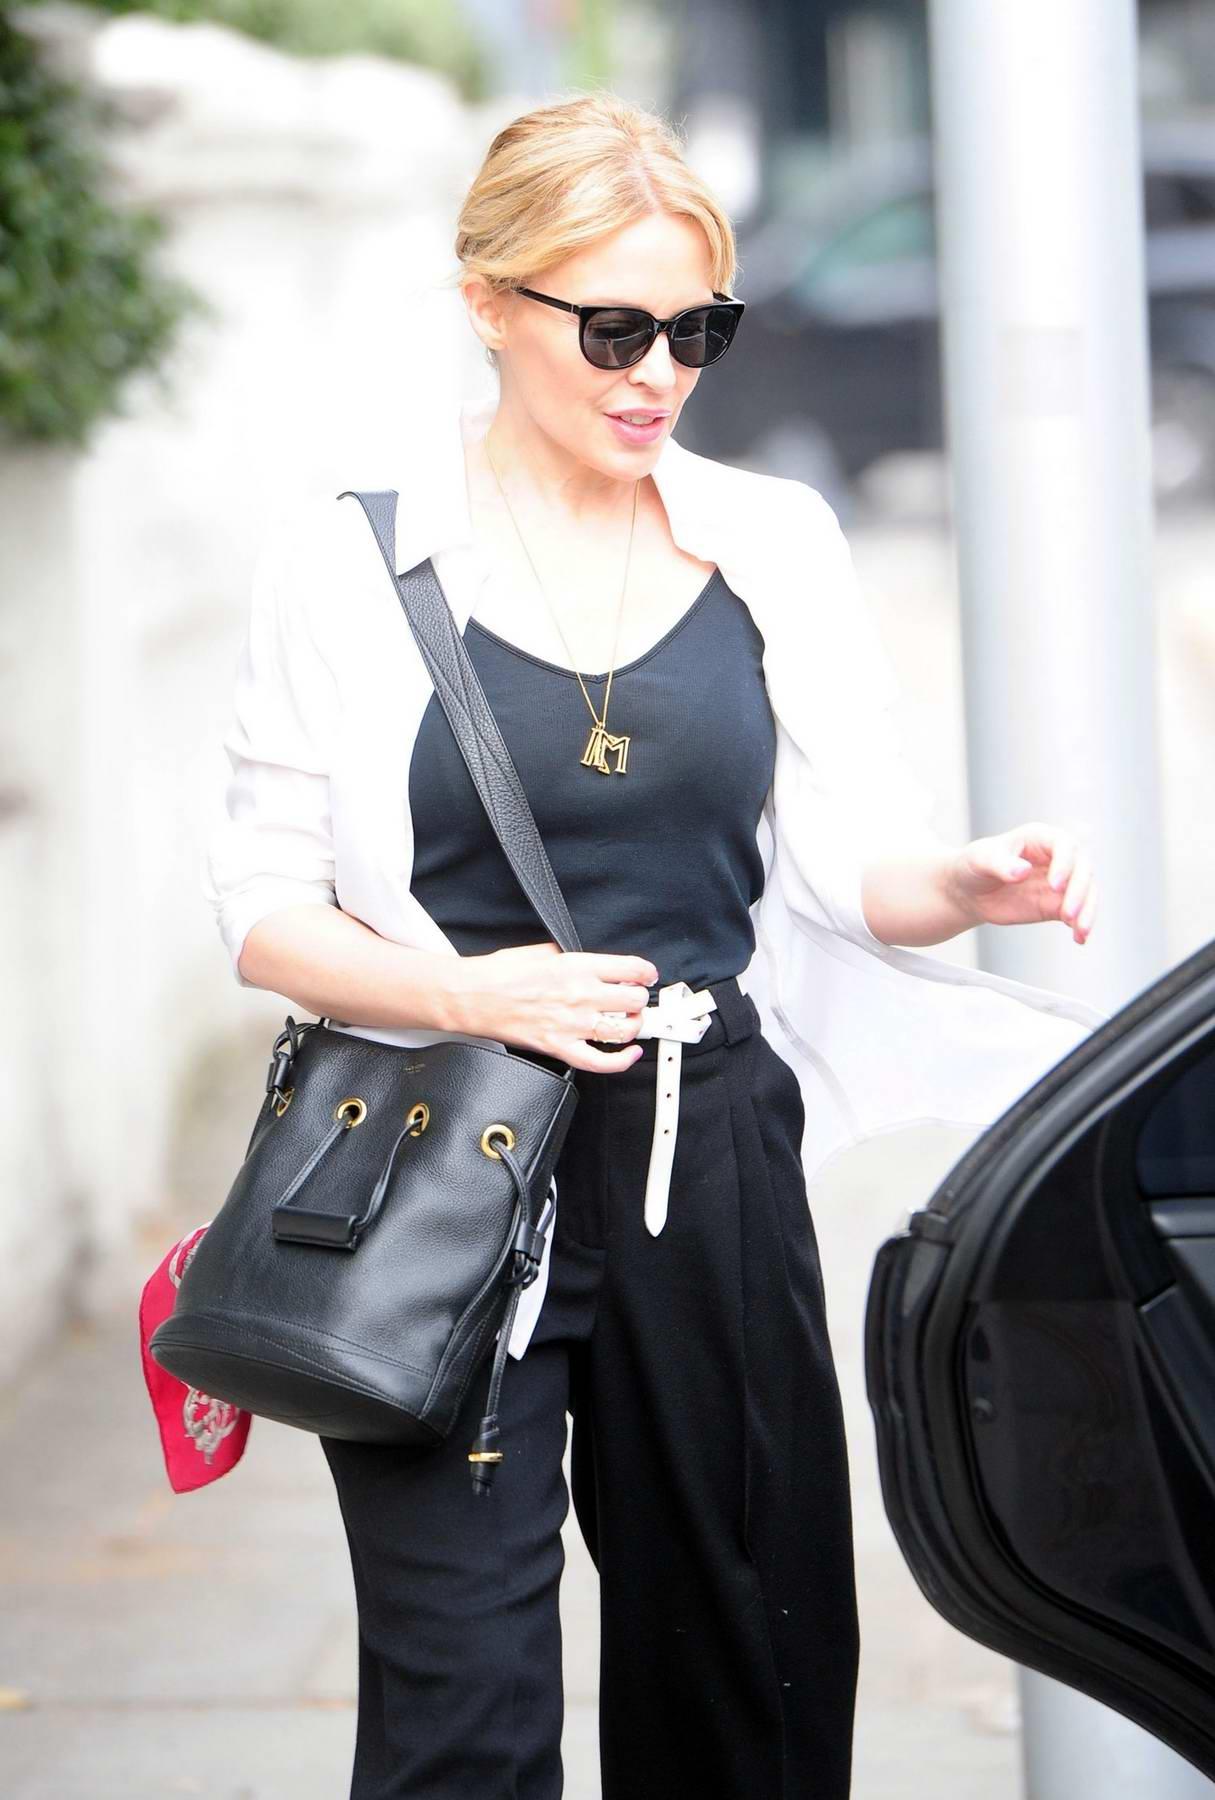 Kylie Minogue leaving her house wearing dark sunglasses in ...